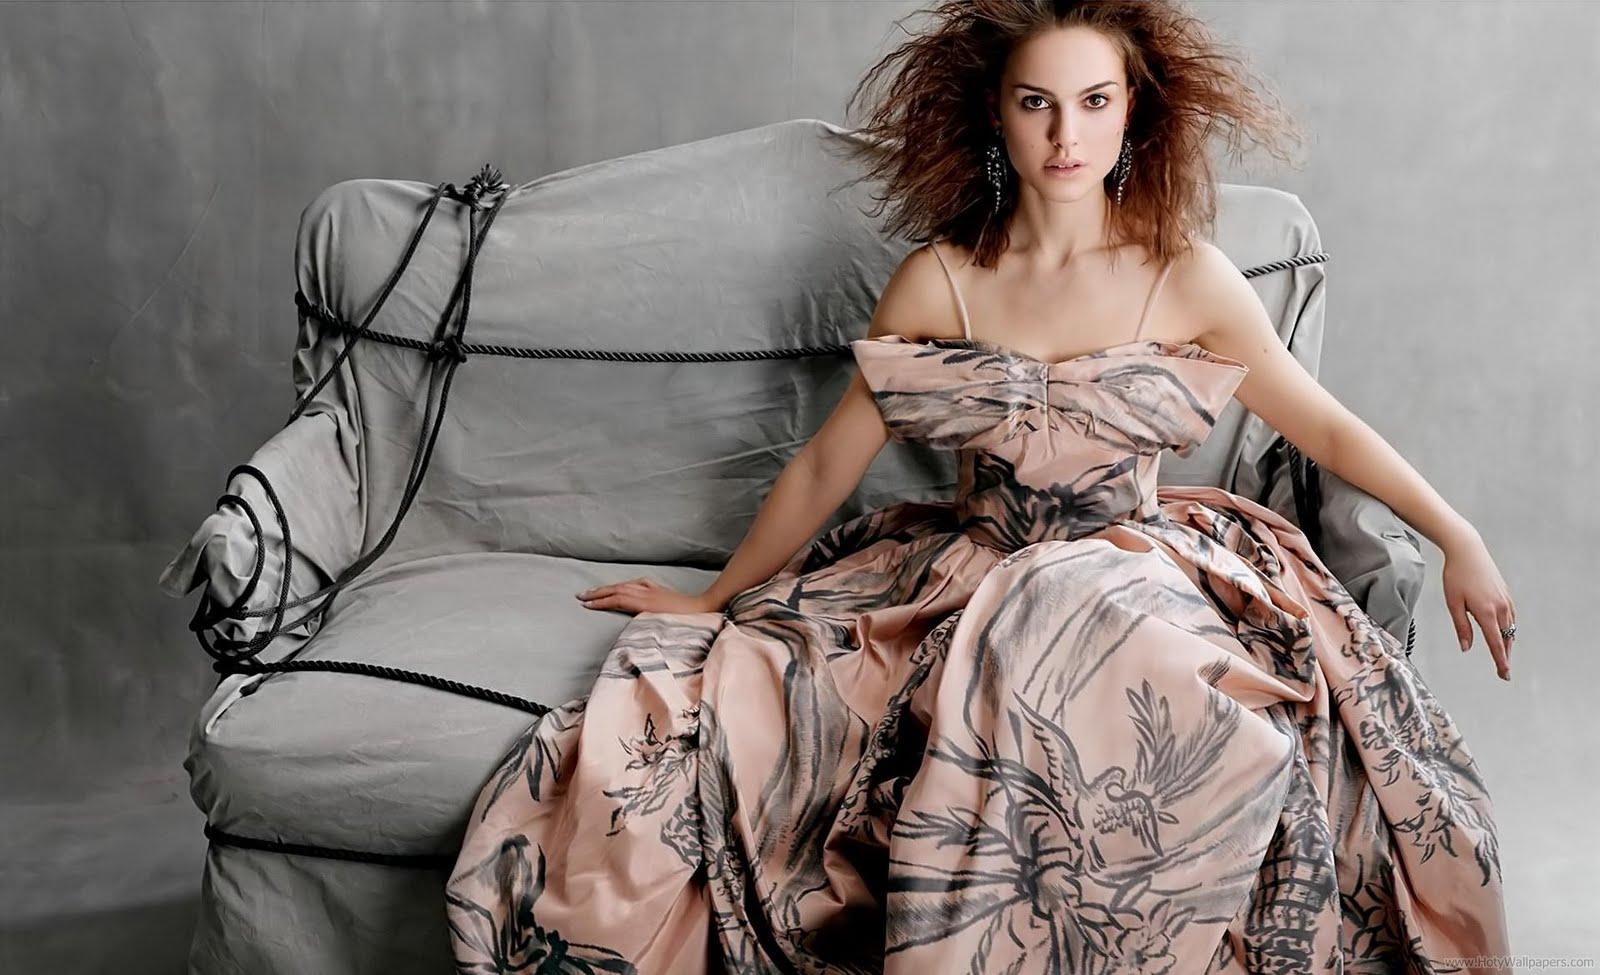 http://1.bp.blogspot.com/-UkA1oWOFJ_0/TrT9LXKtCzI/AAAAAAAAOmA/alyENG9RdRs/s1600/natalie_portman_hollywood_glamorous_actress_wallpaper.jpg